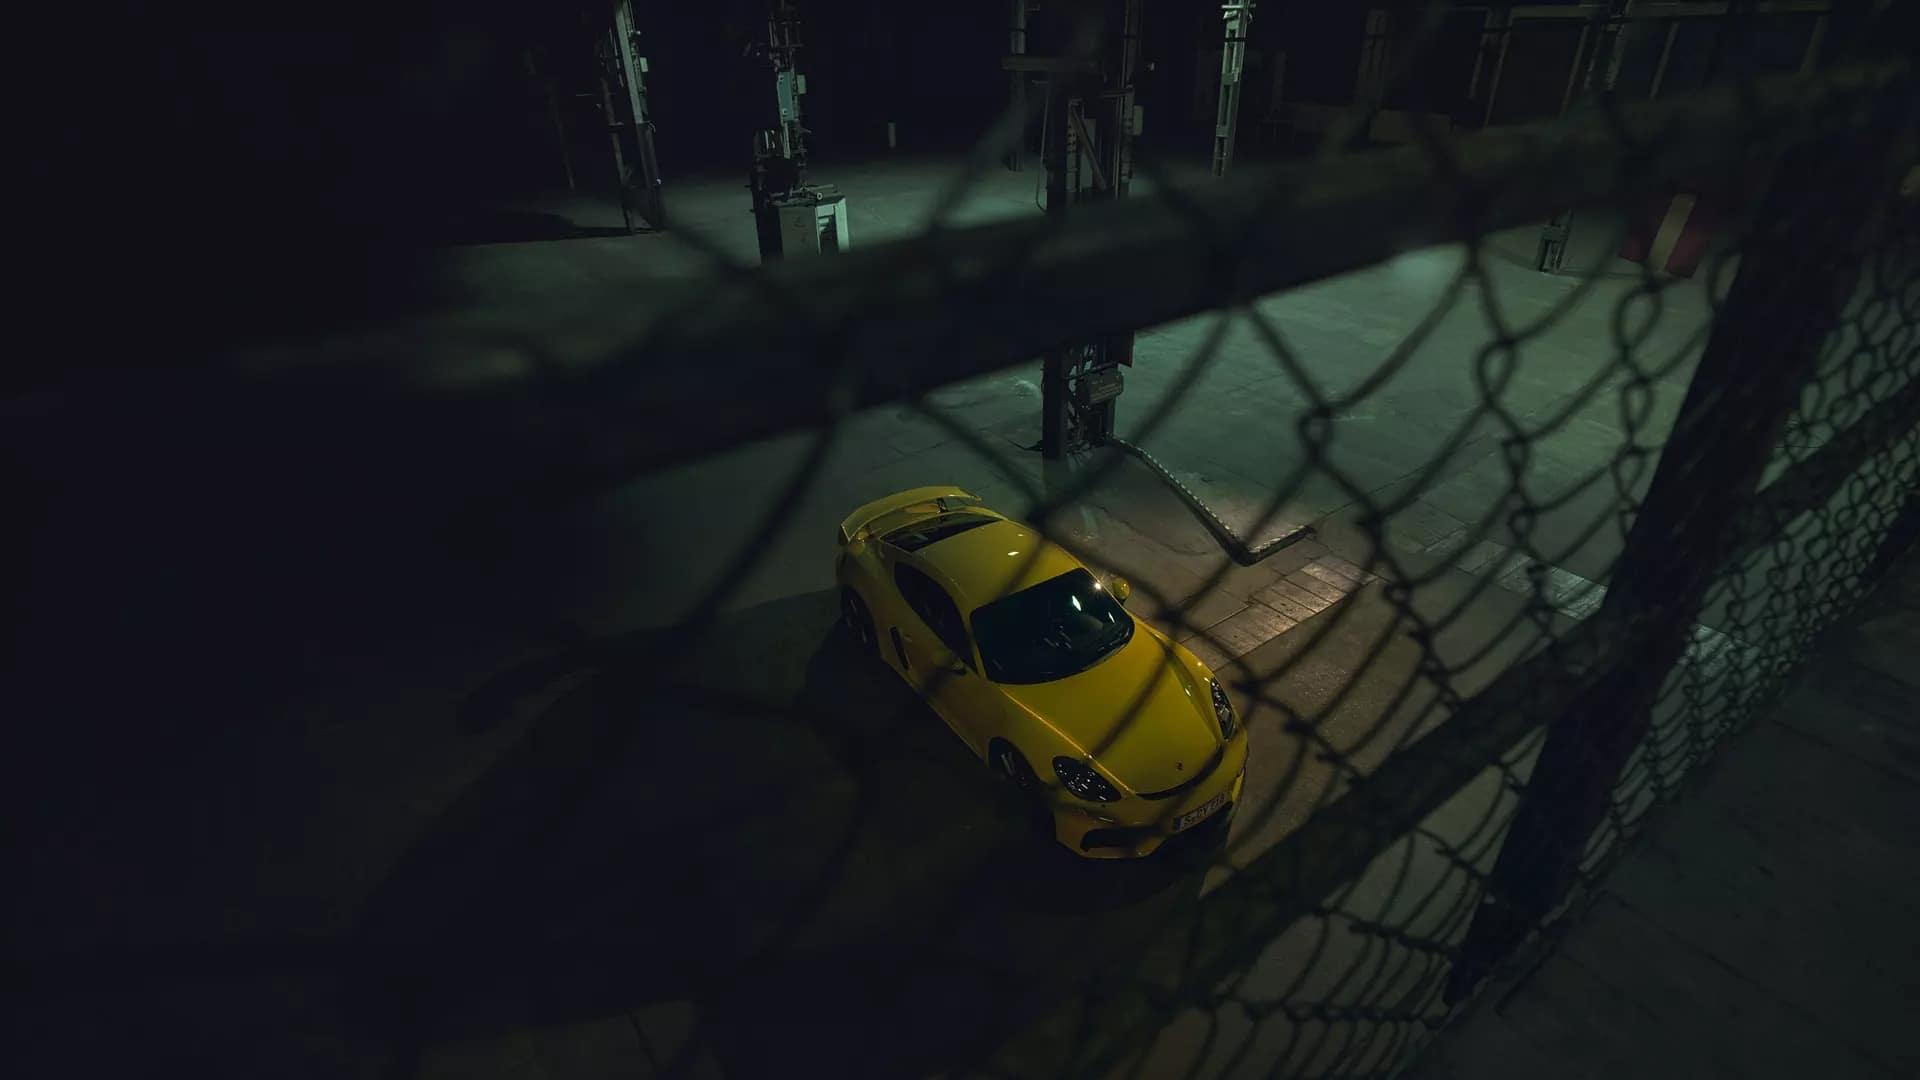 2020 Porsche 718 Cayman GT4 Safety